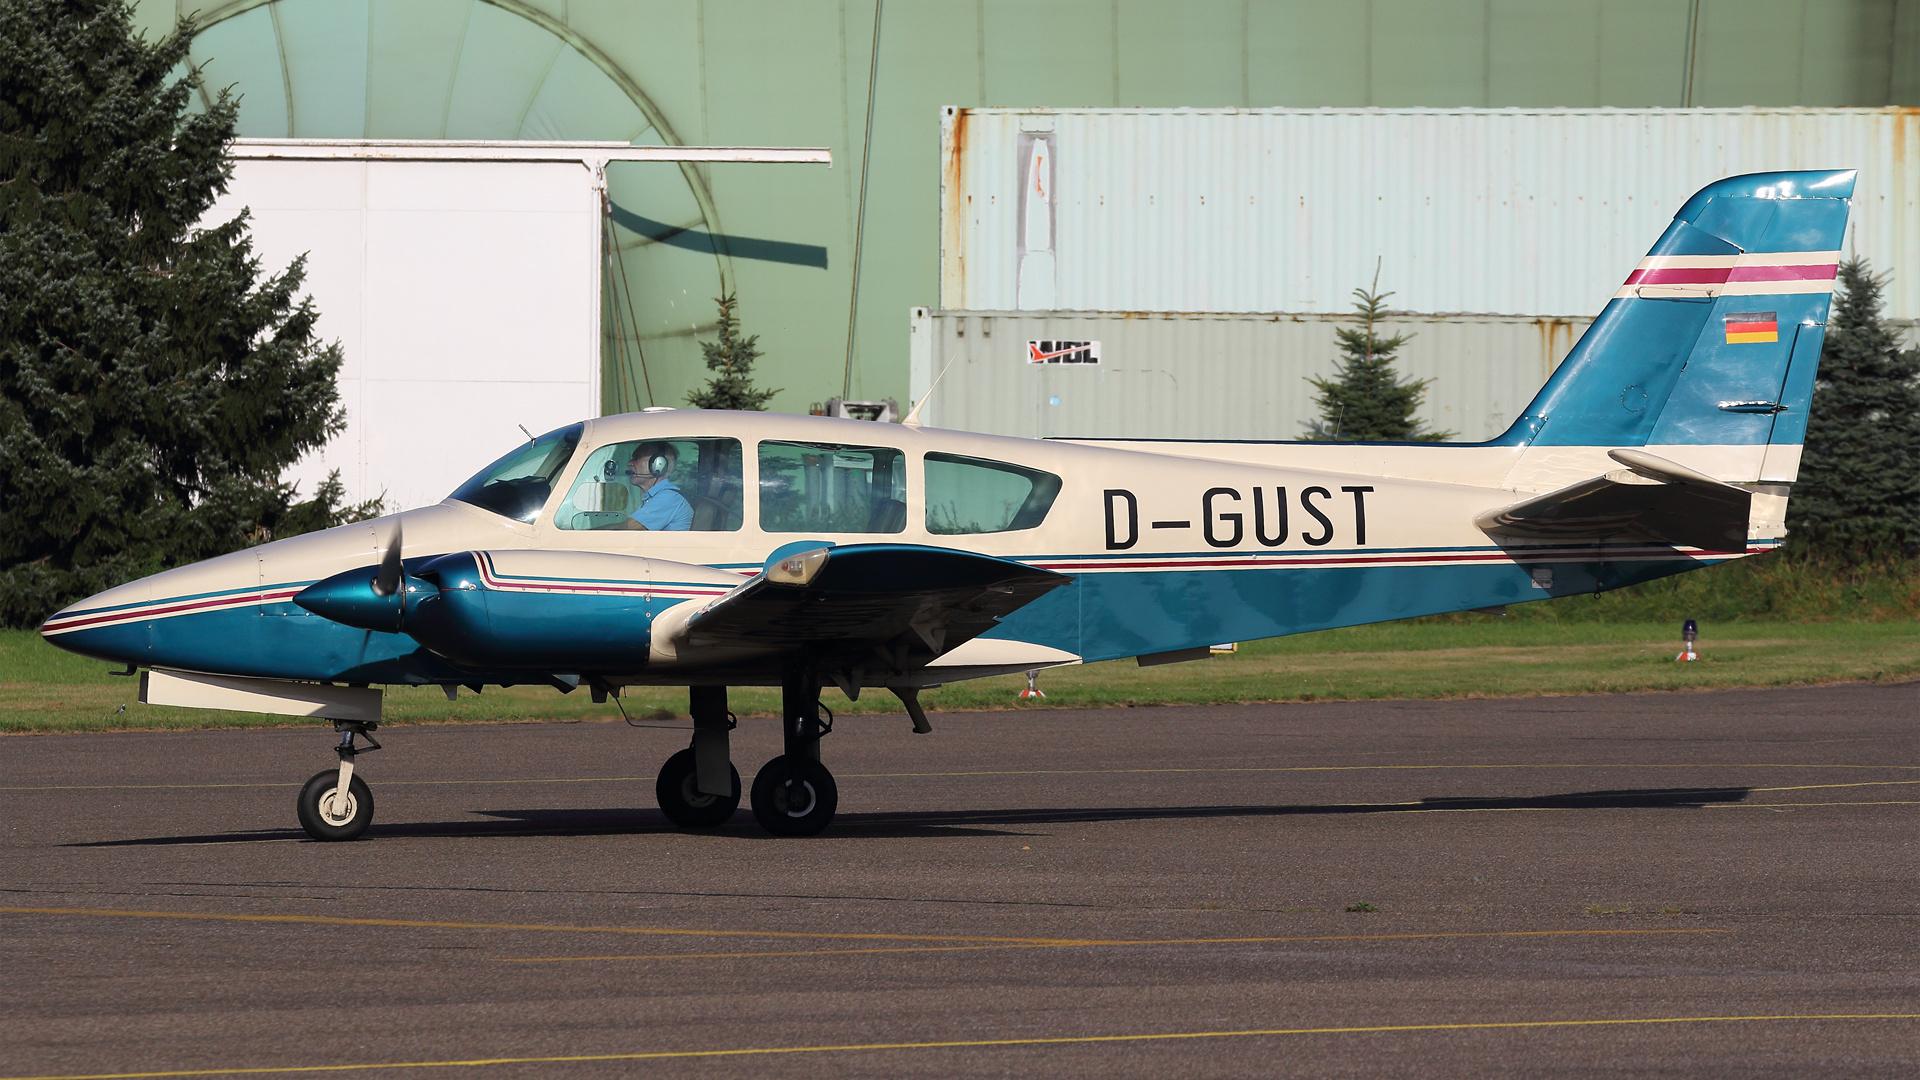 D-GUST-1 Grumman GA-7 Cougar ESS 201609